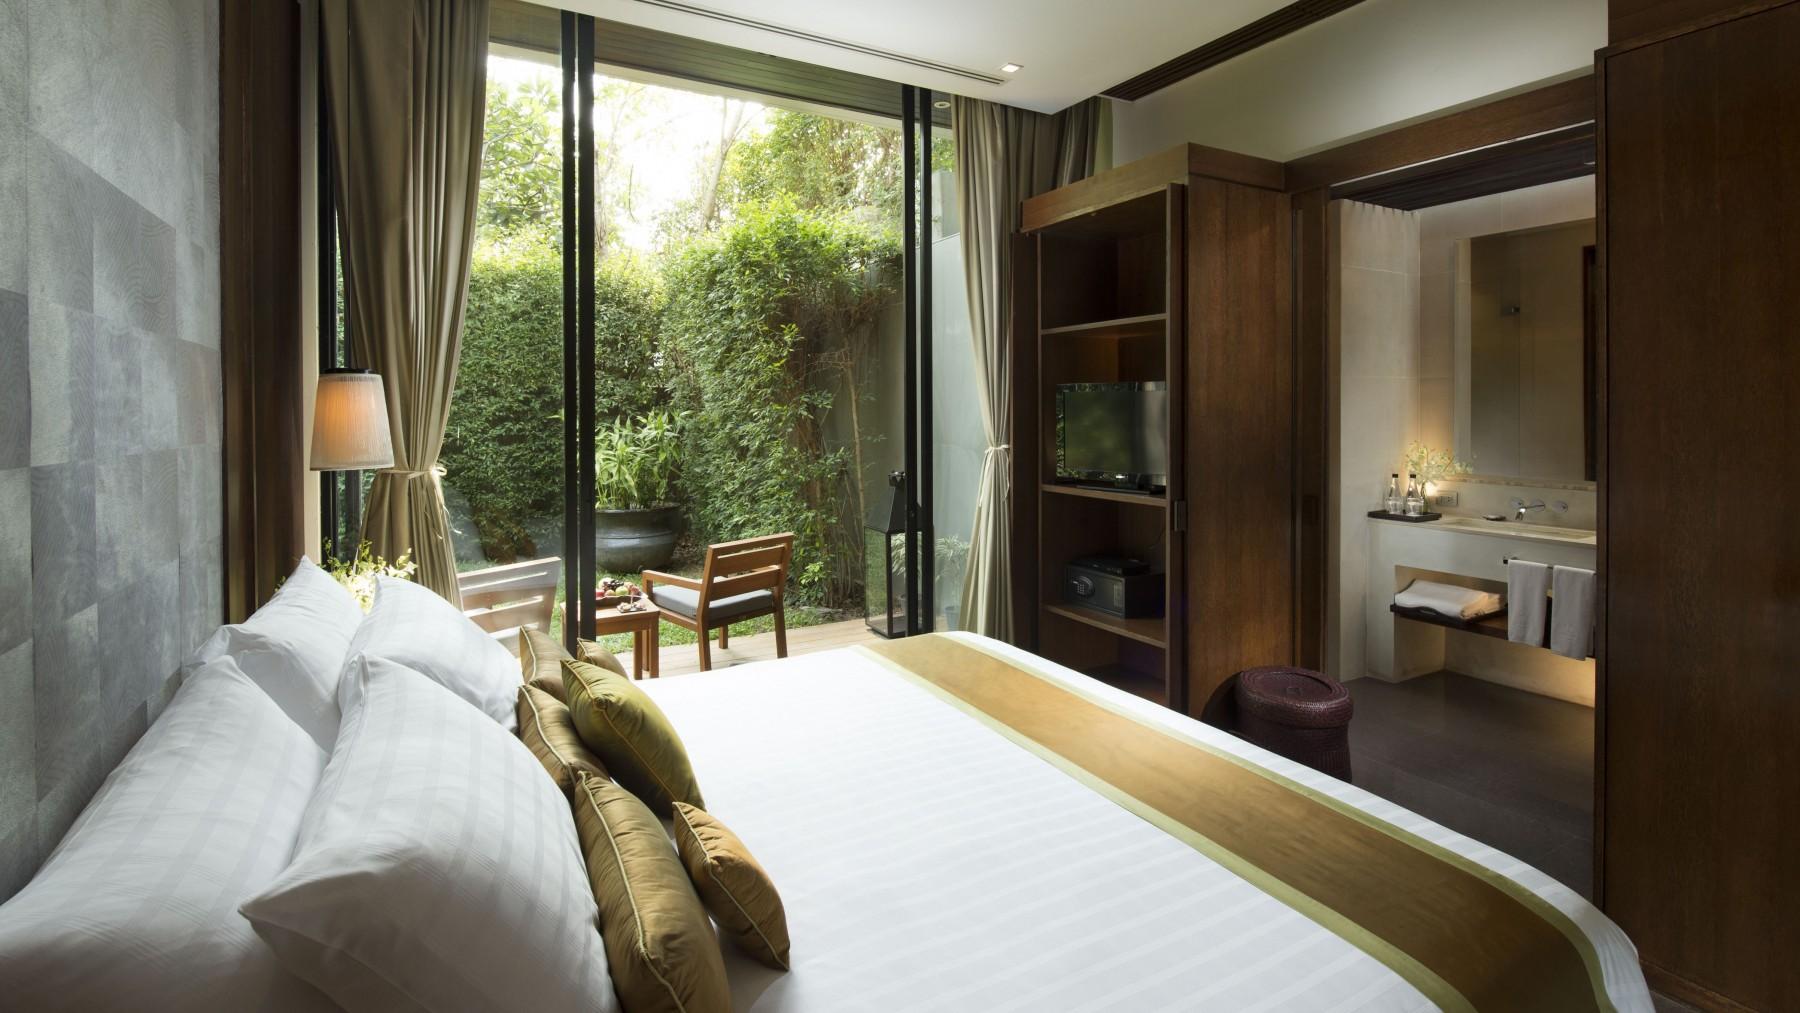 Two Bedroom Villa Hua Hin